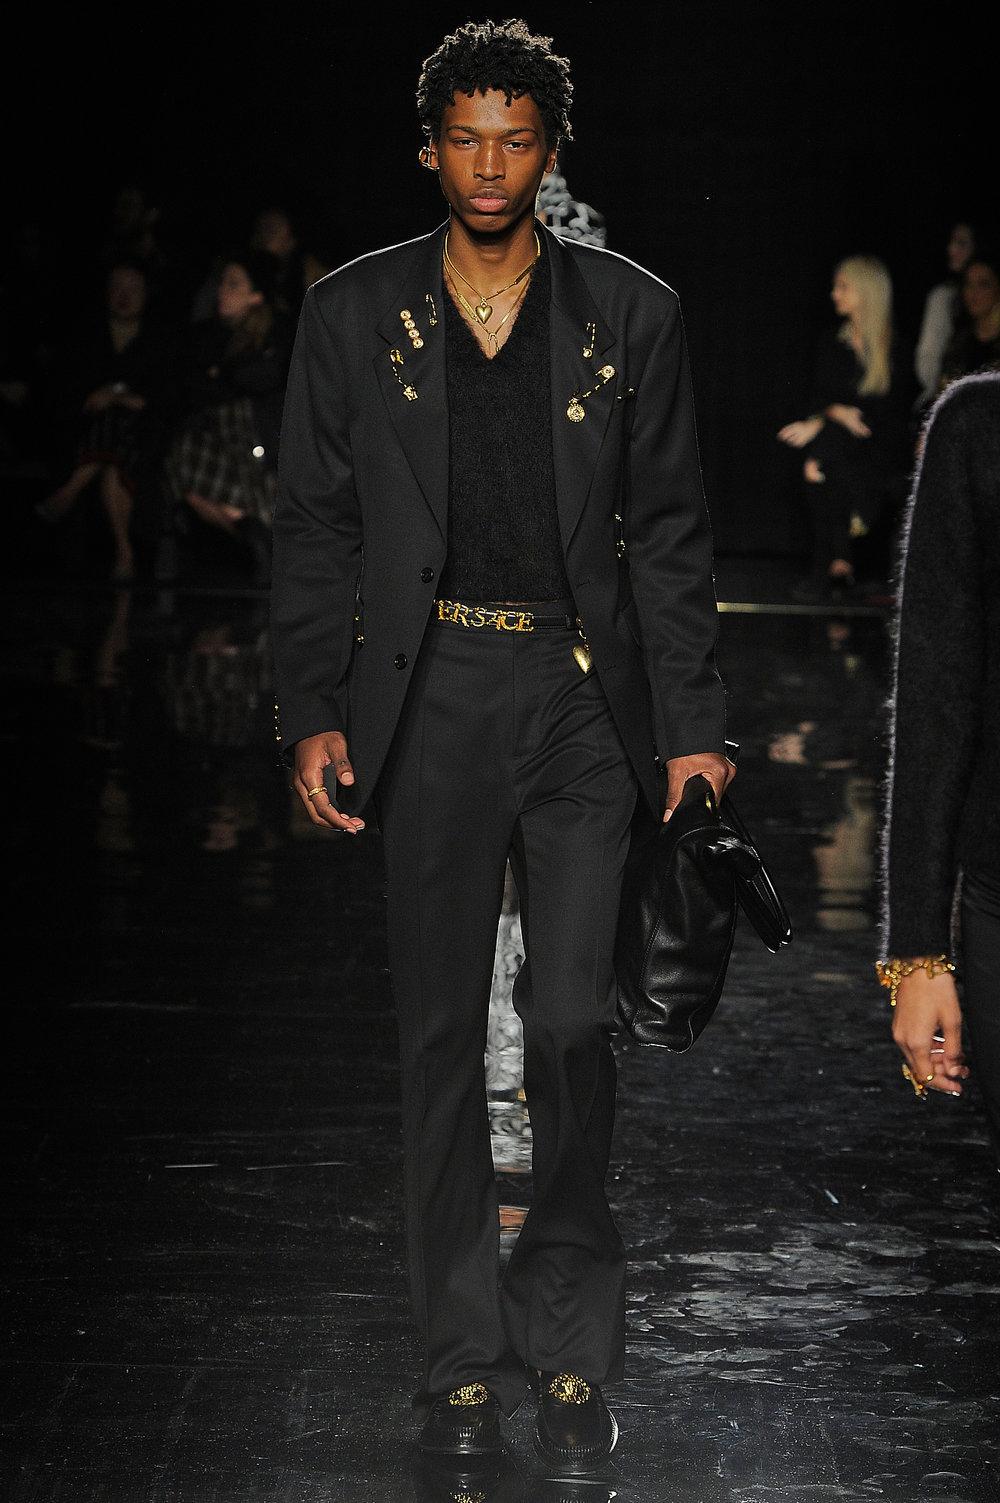 Versace_19_c1_versace_runway_runway_00019.jpg